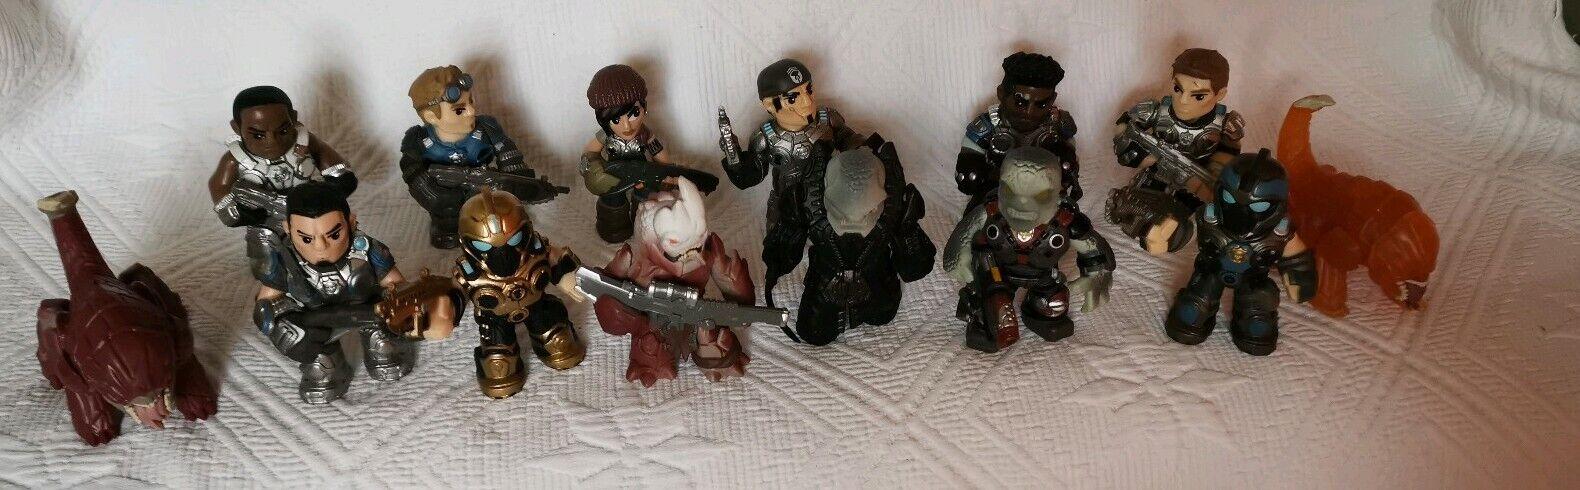 Diverdeimentoko Gears of War Mystery  Minis x14  nuova esclusiva di fascia alta